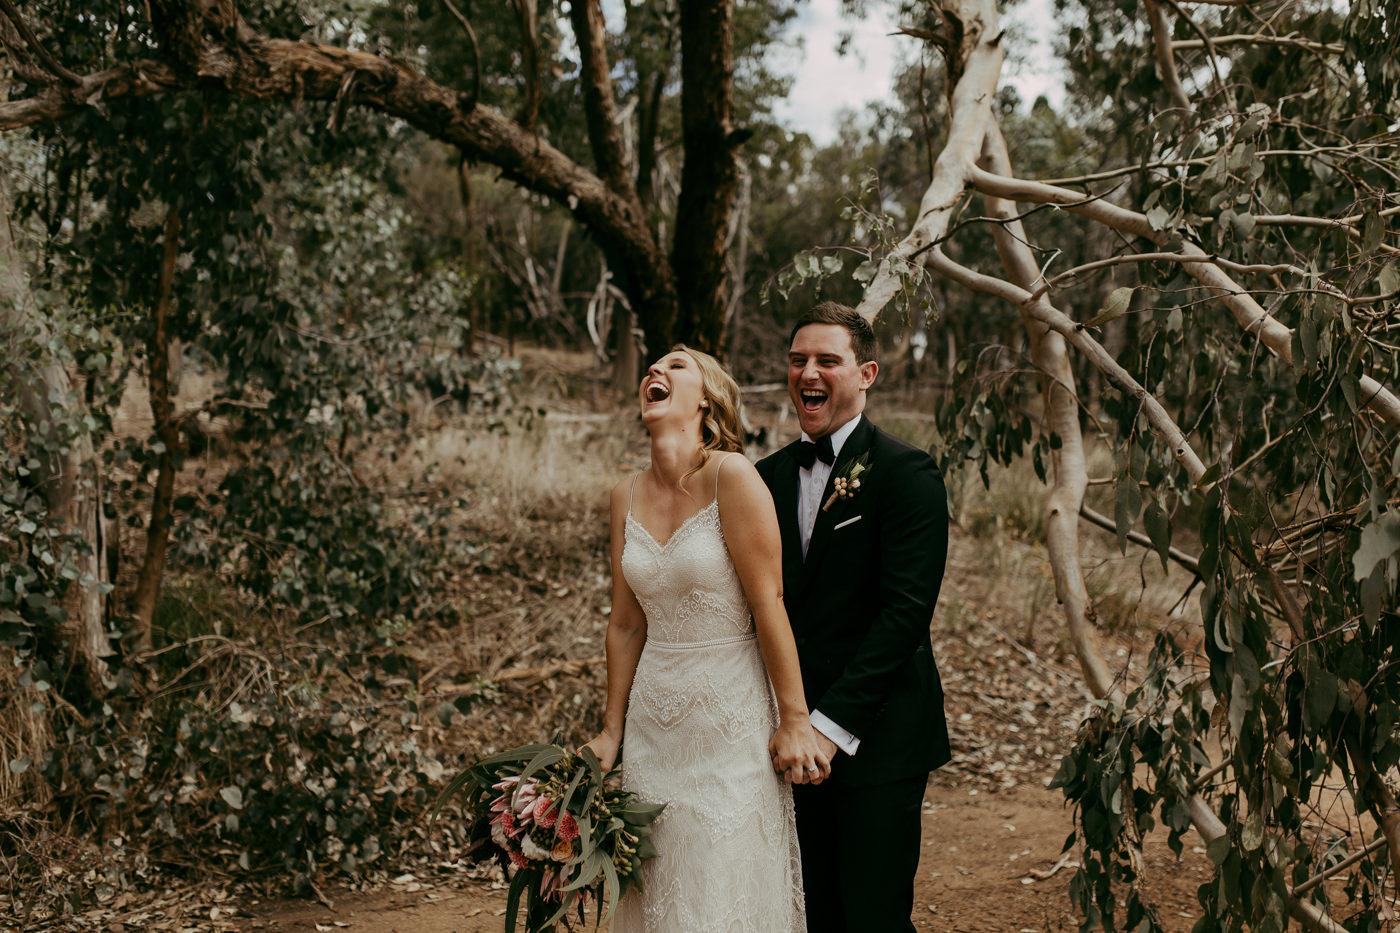 Anthony & Eliet - Wagga Wagga Wedding - Country NSW - Samantha Heather Photography-62.jpg